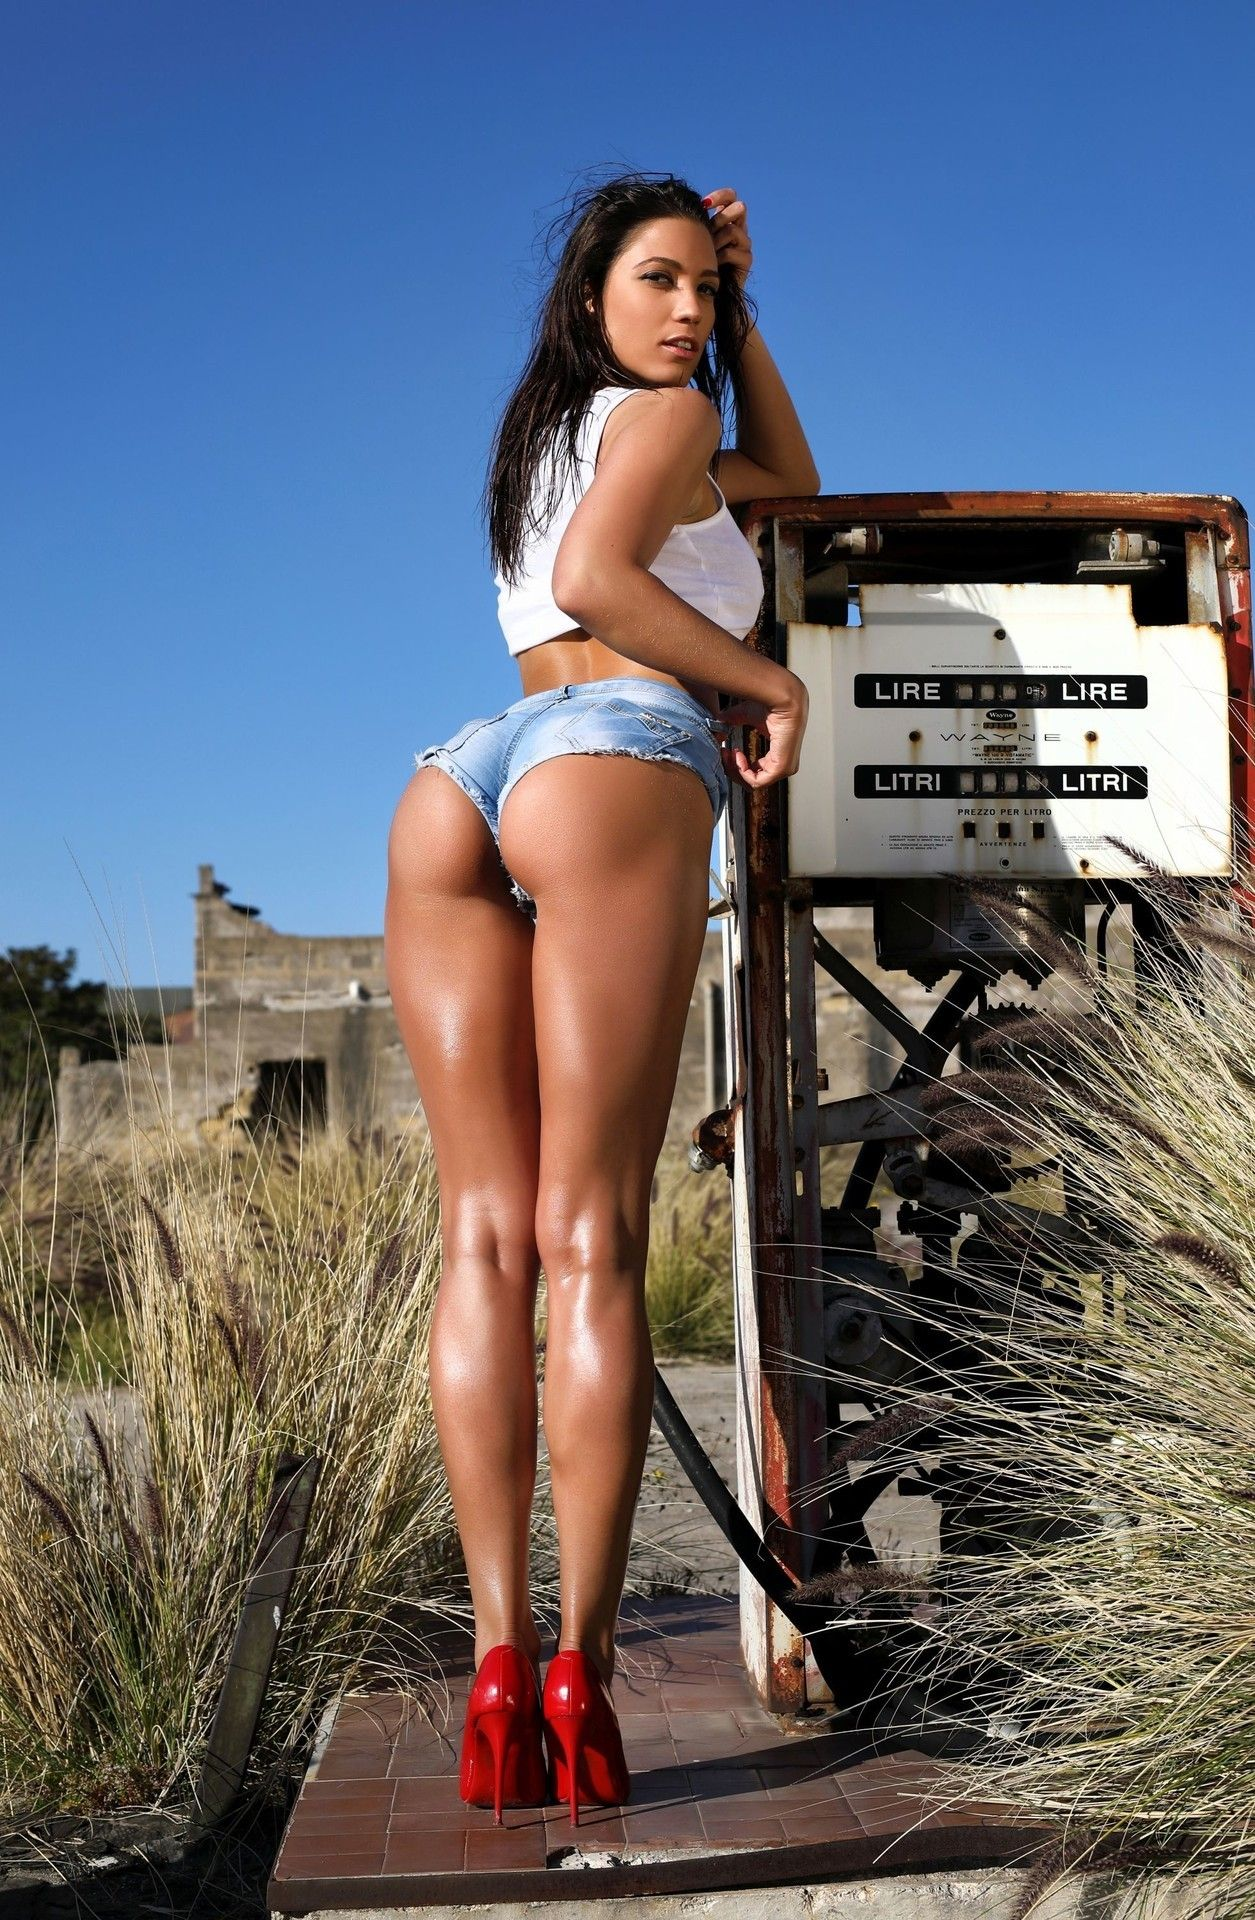 Sexy Tourist Has Nice Legs And